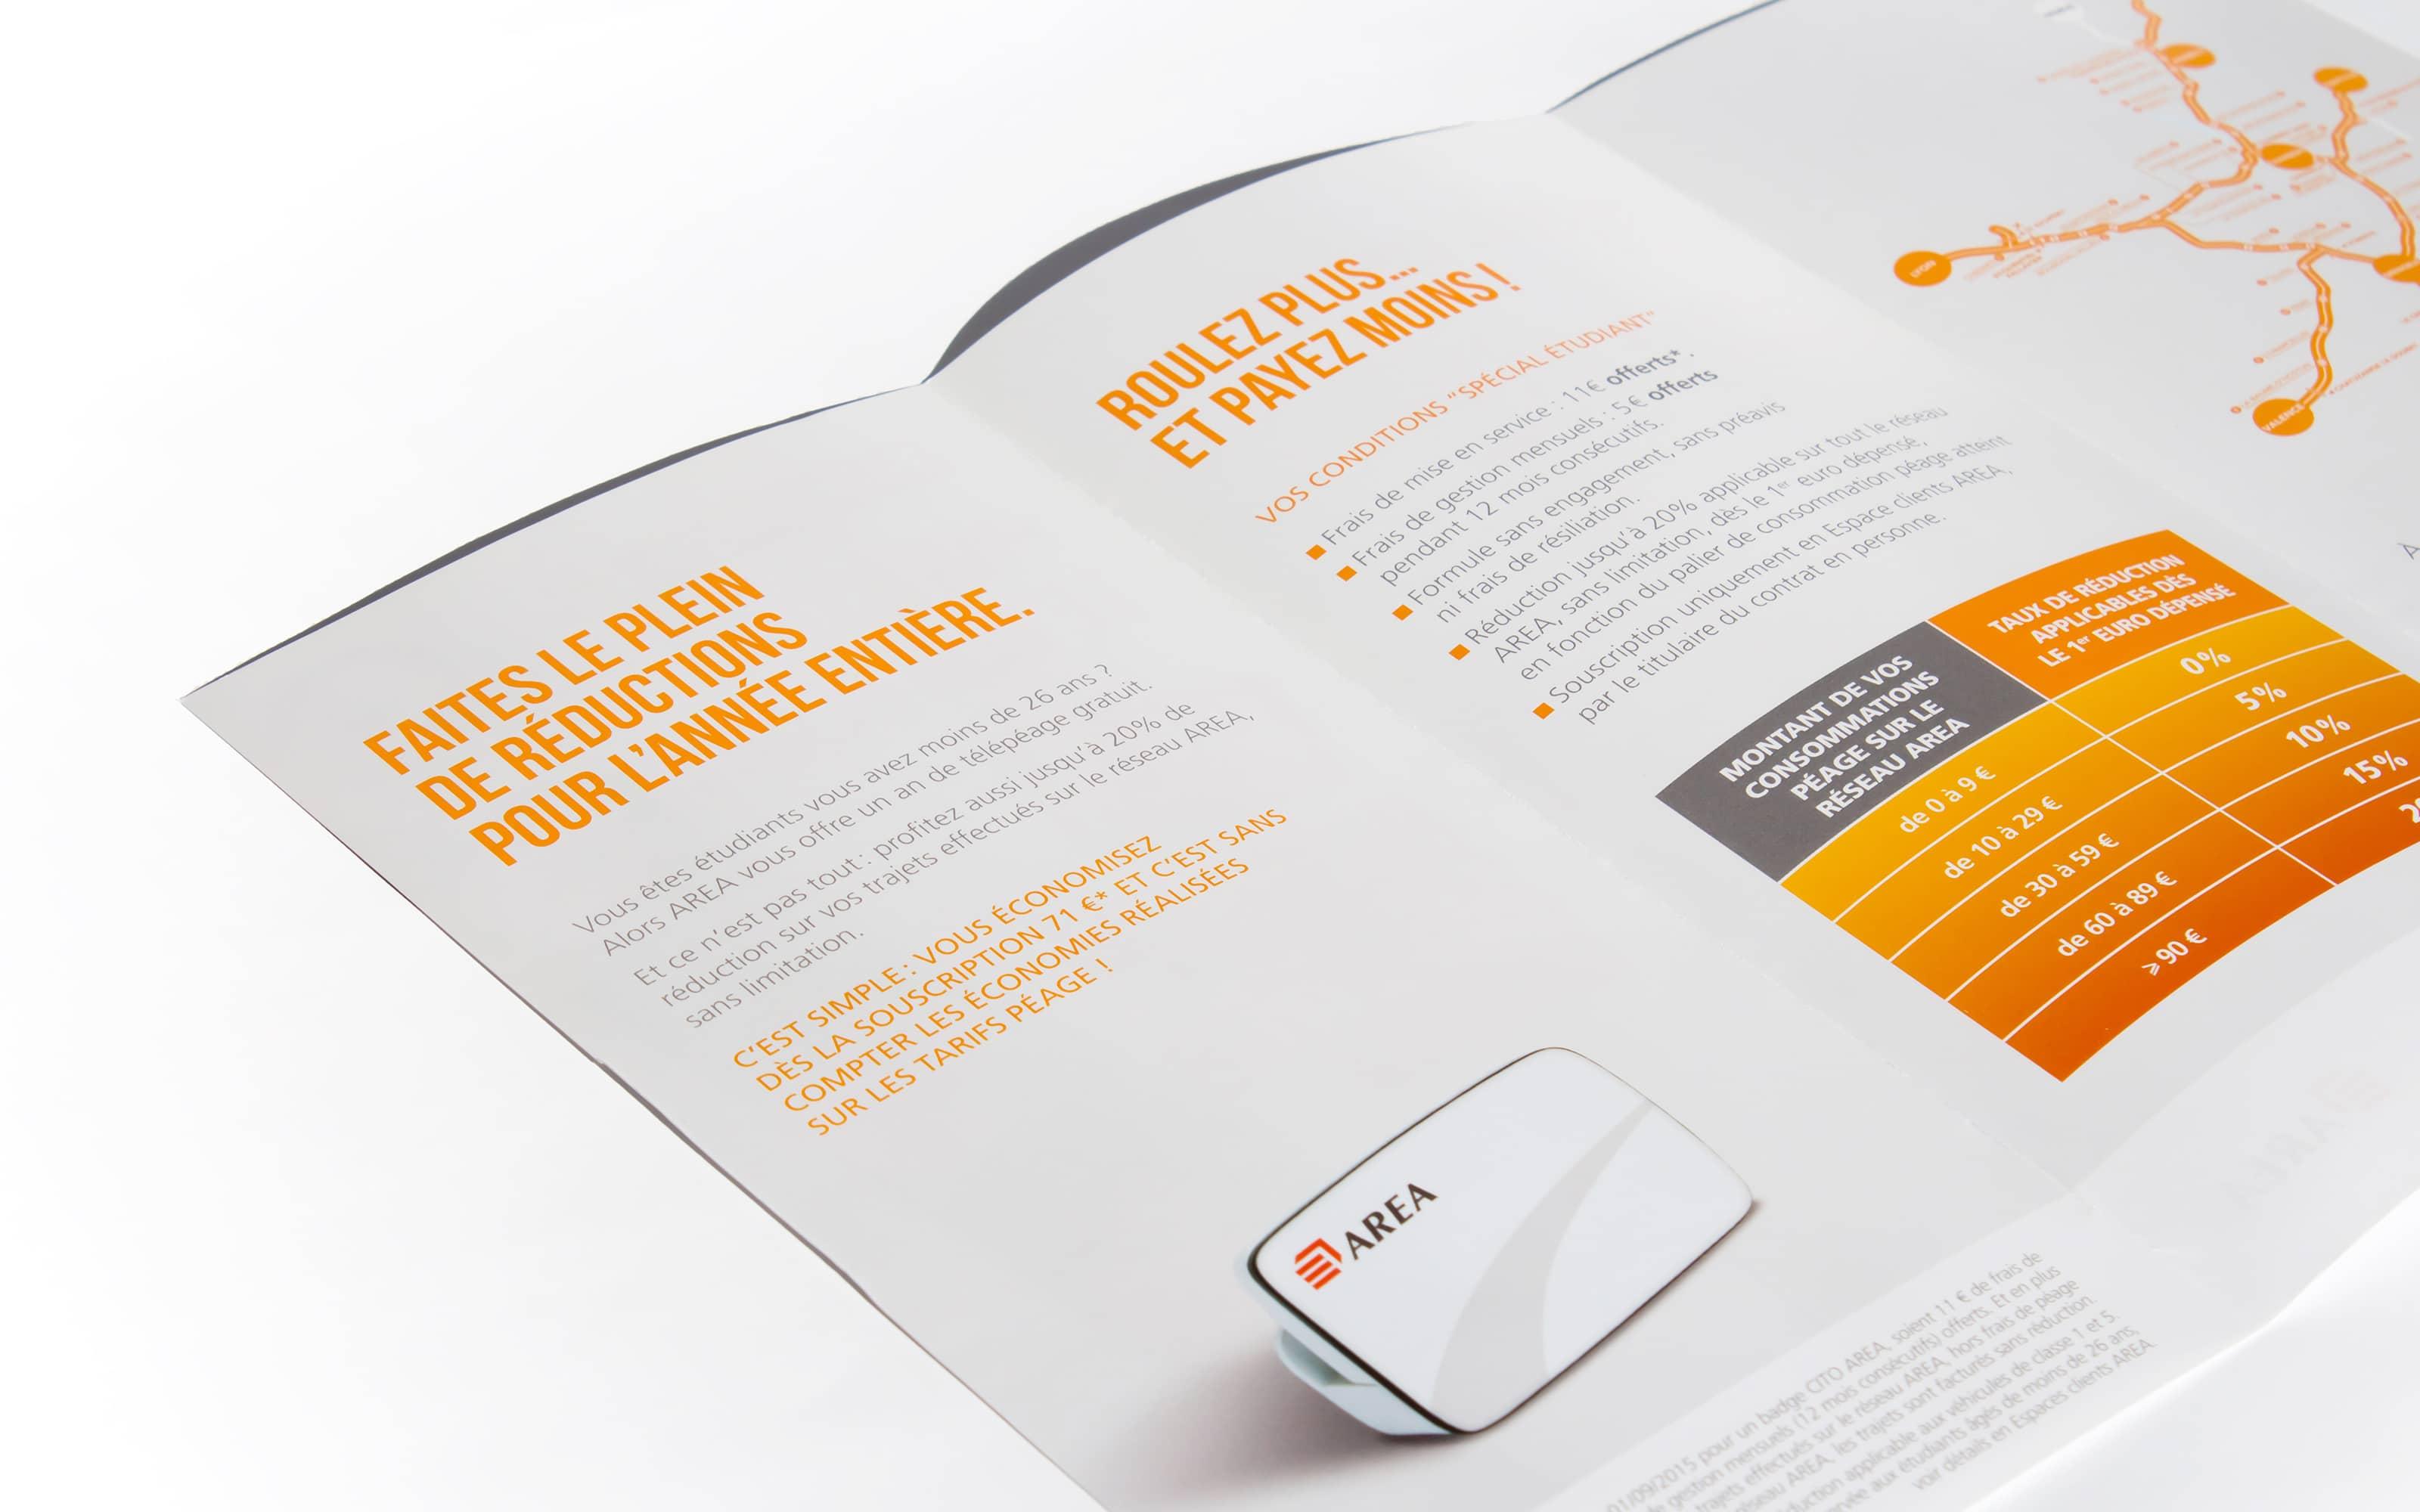 Plaquette Telepeage AREA-APRR Groupe Eiffage - Une creation STARFACTORY Communication